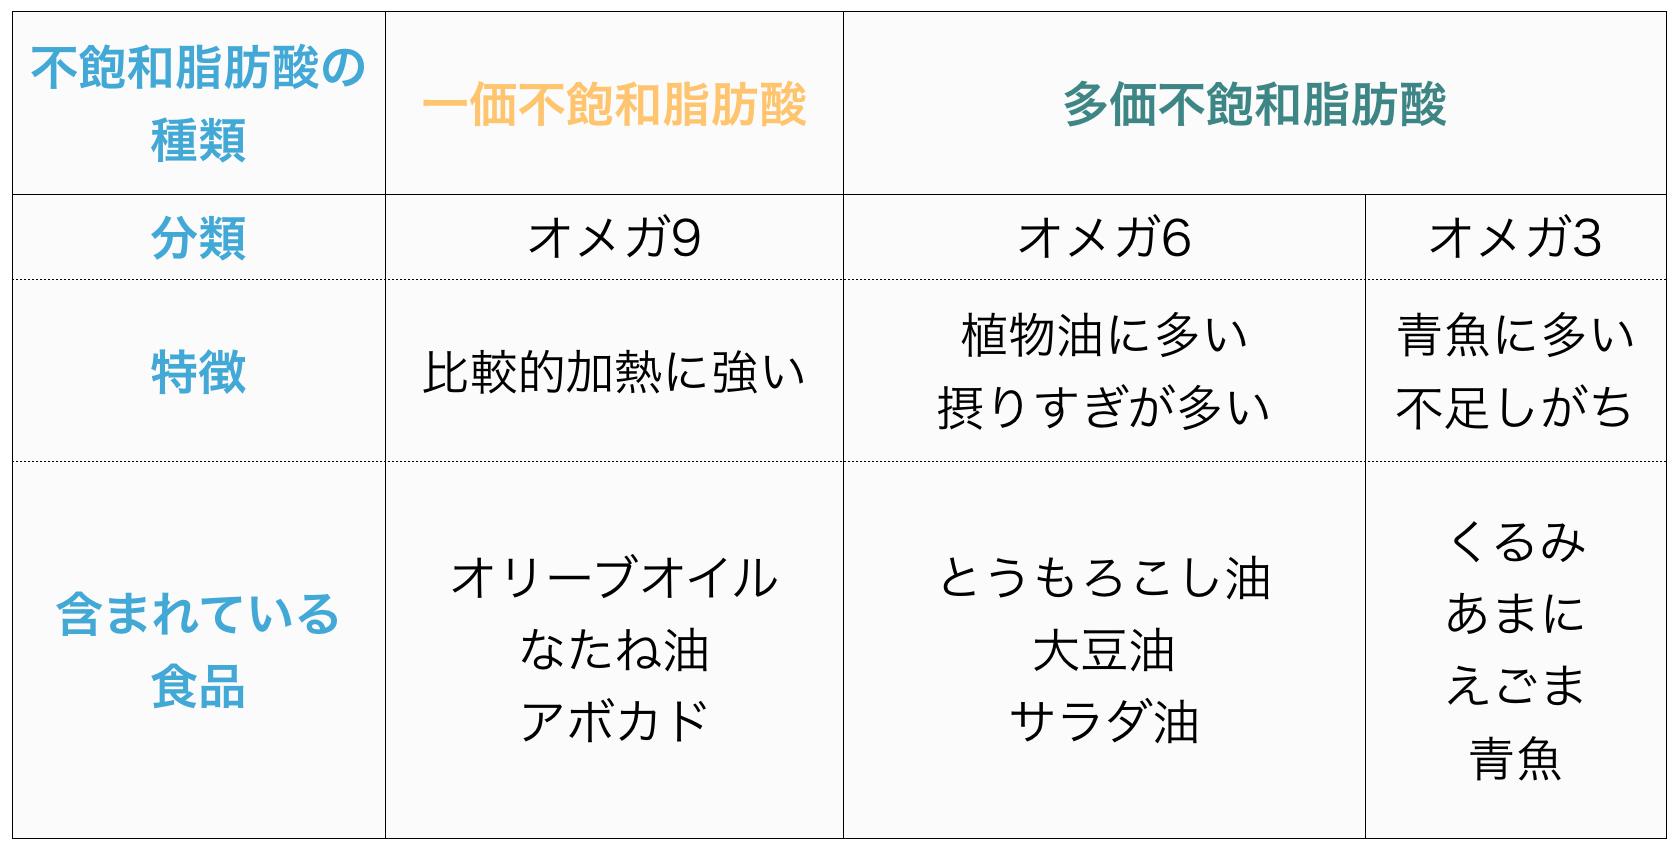 不飽和脂肪酸の種類